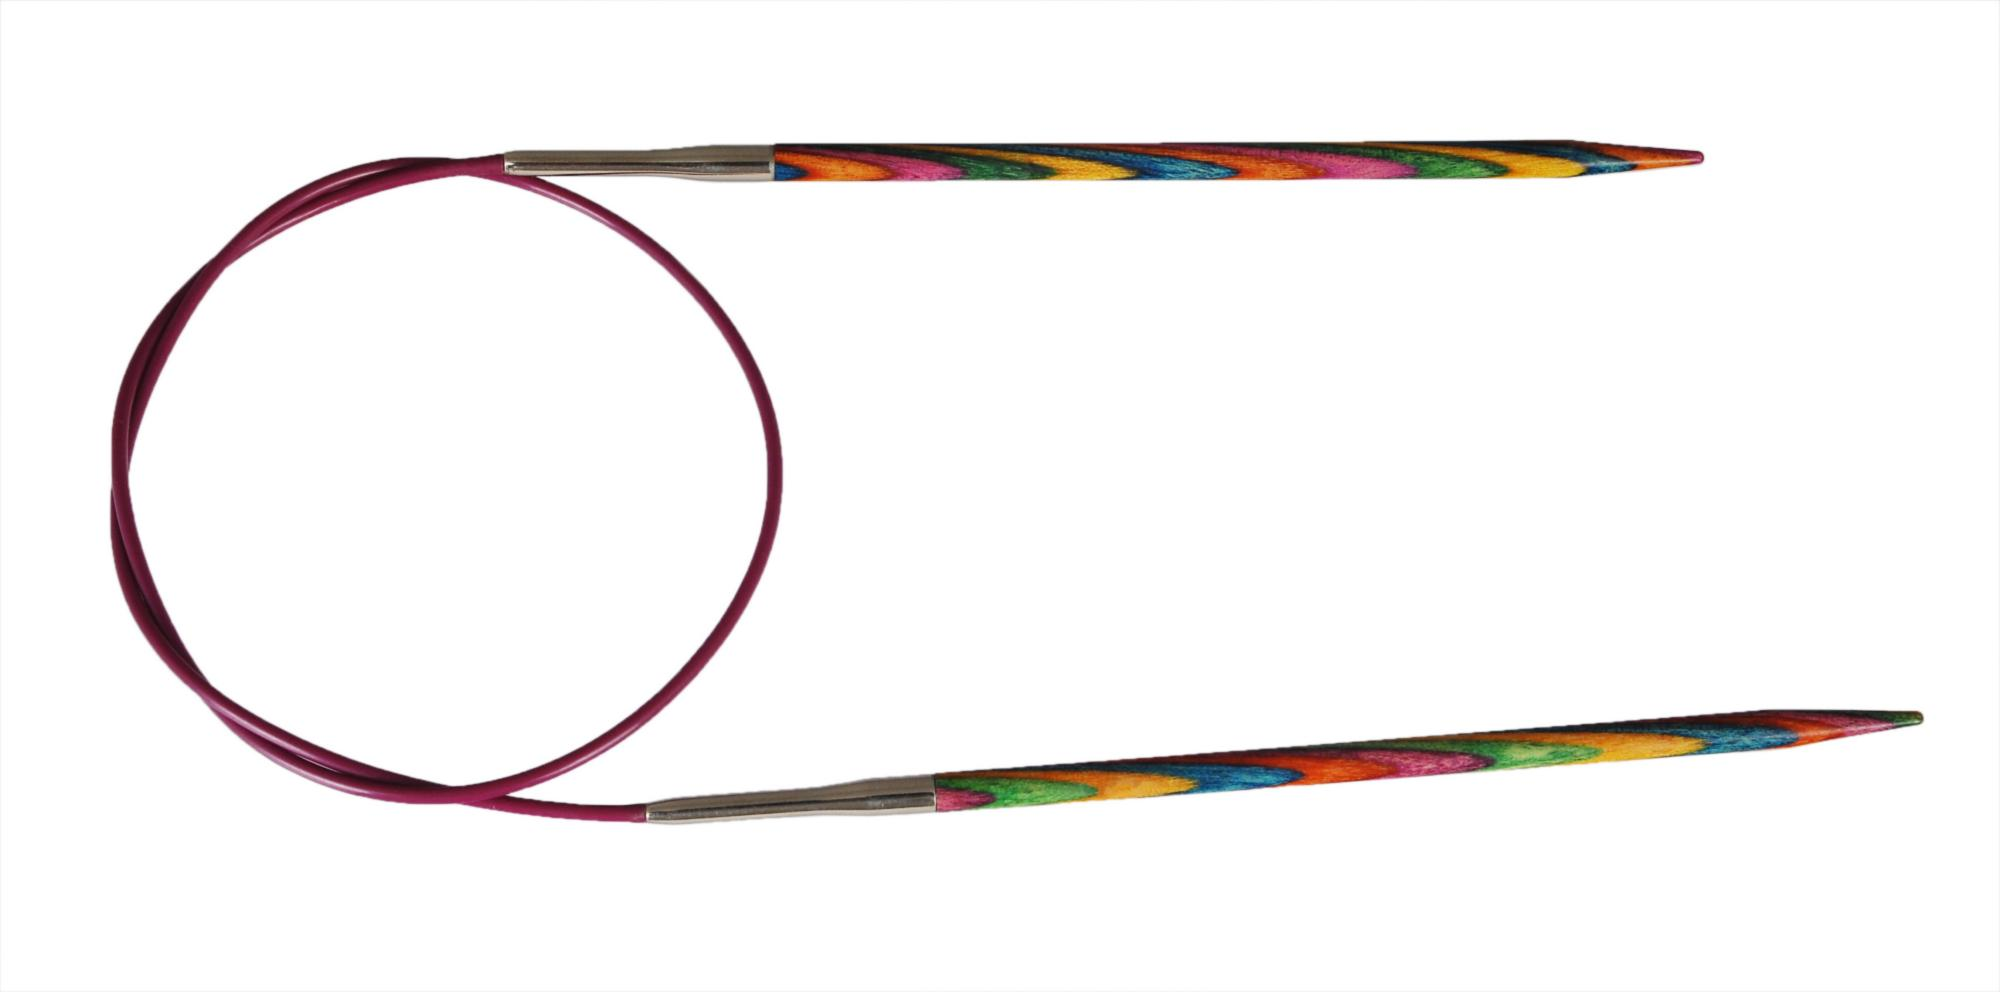 Спицы круговые 150 см Symfonie Wood KnitPro, 20513, 2.50 мм